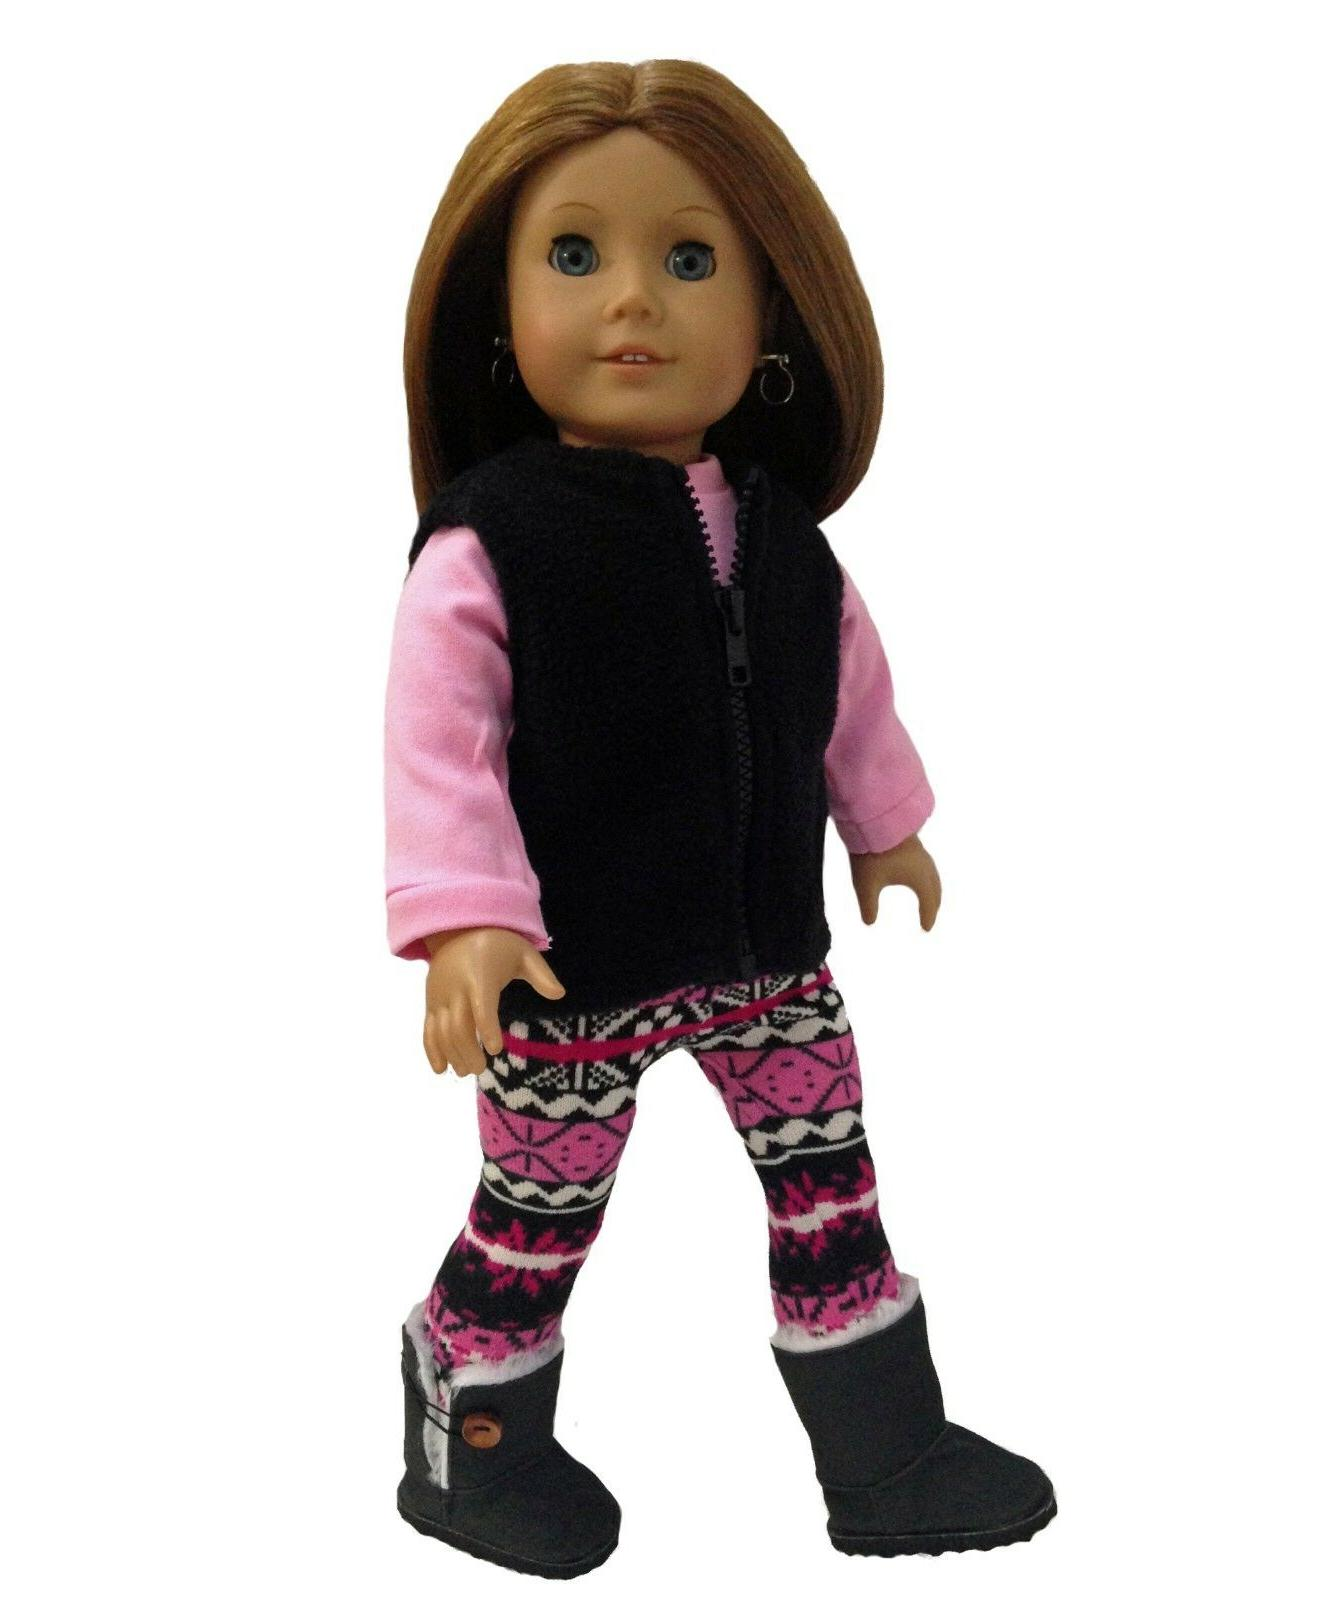 doll clothes fleece vest pink shirt print